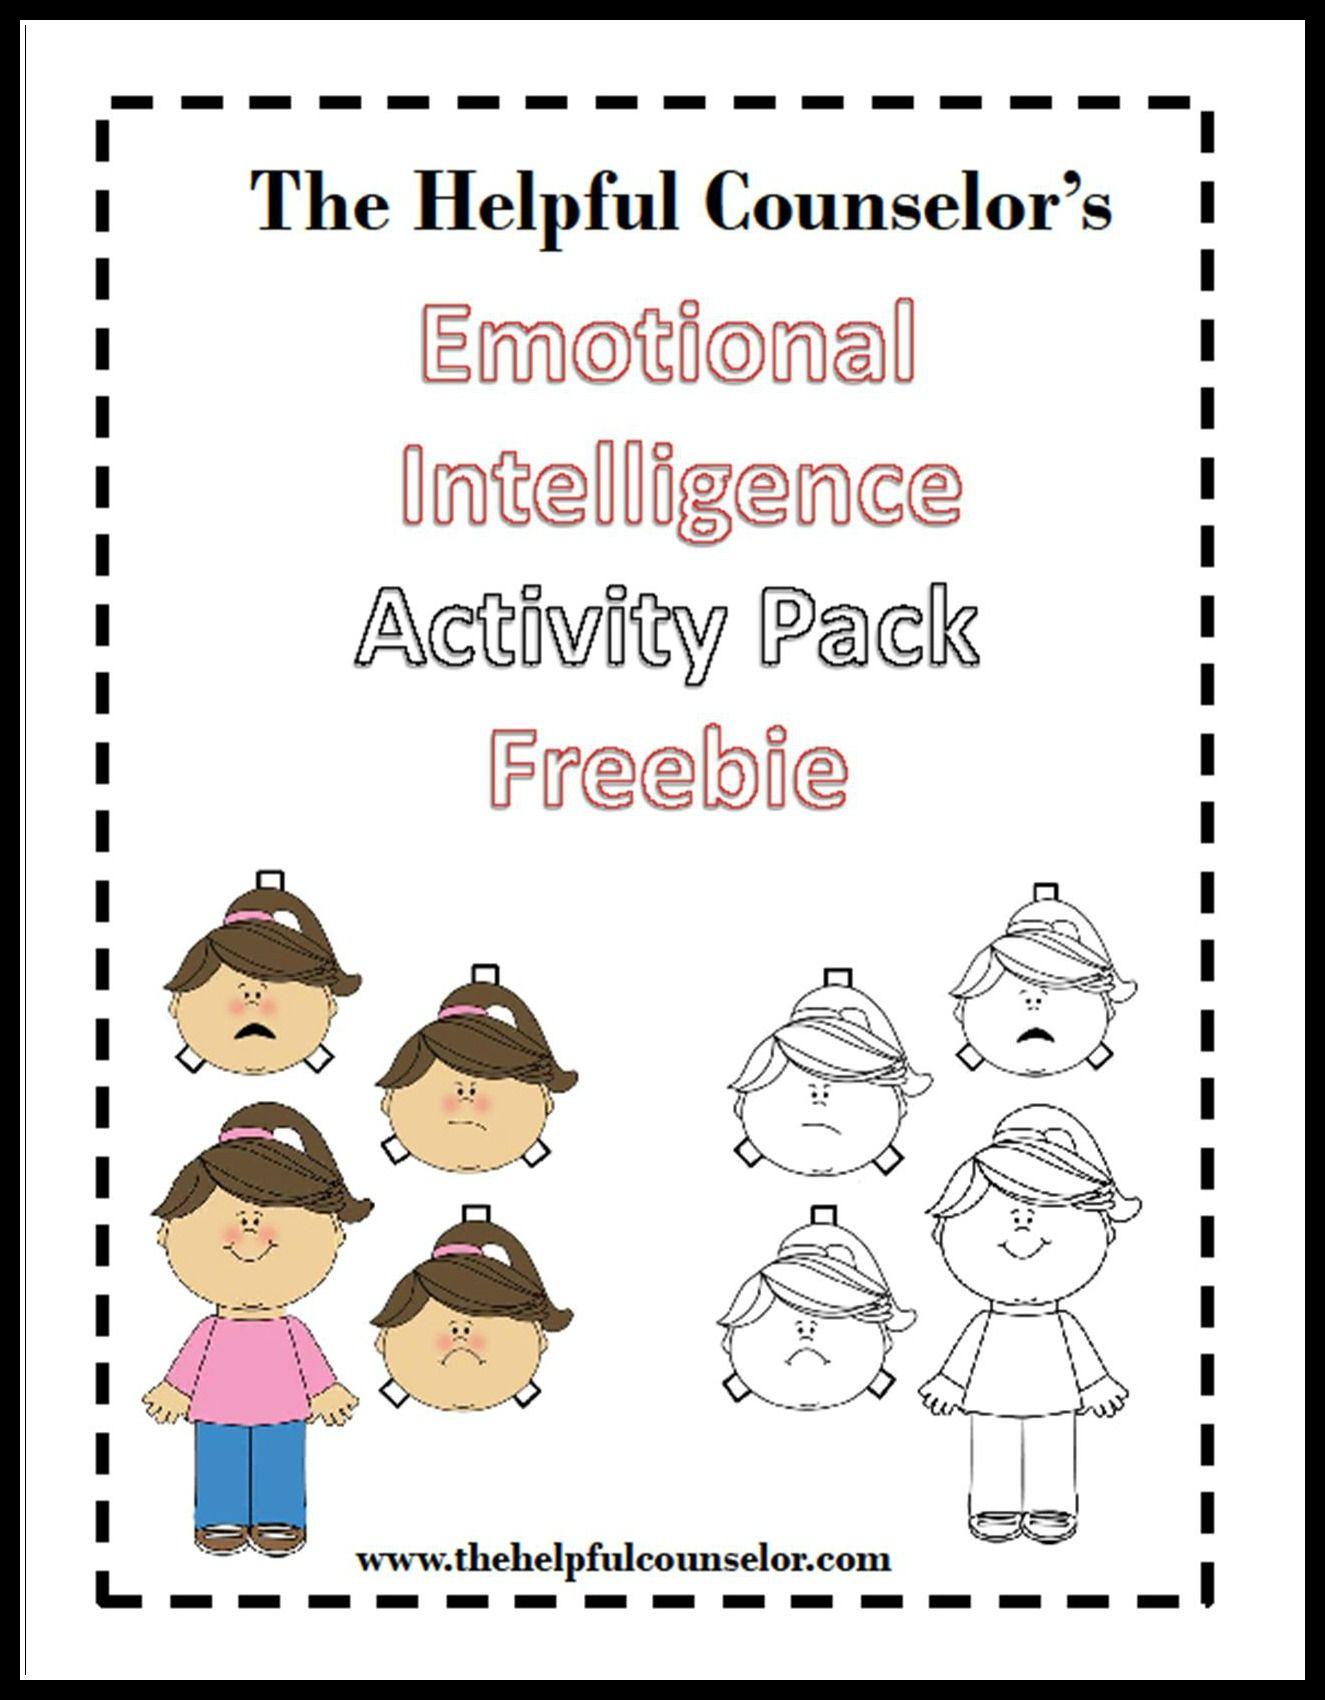 Emotional Intelligence Free Activities